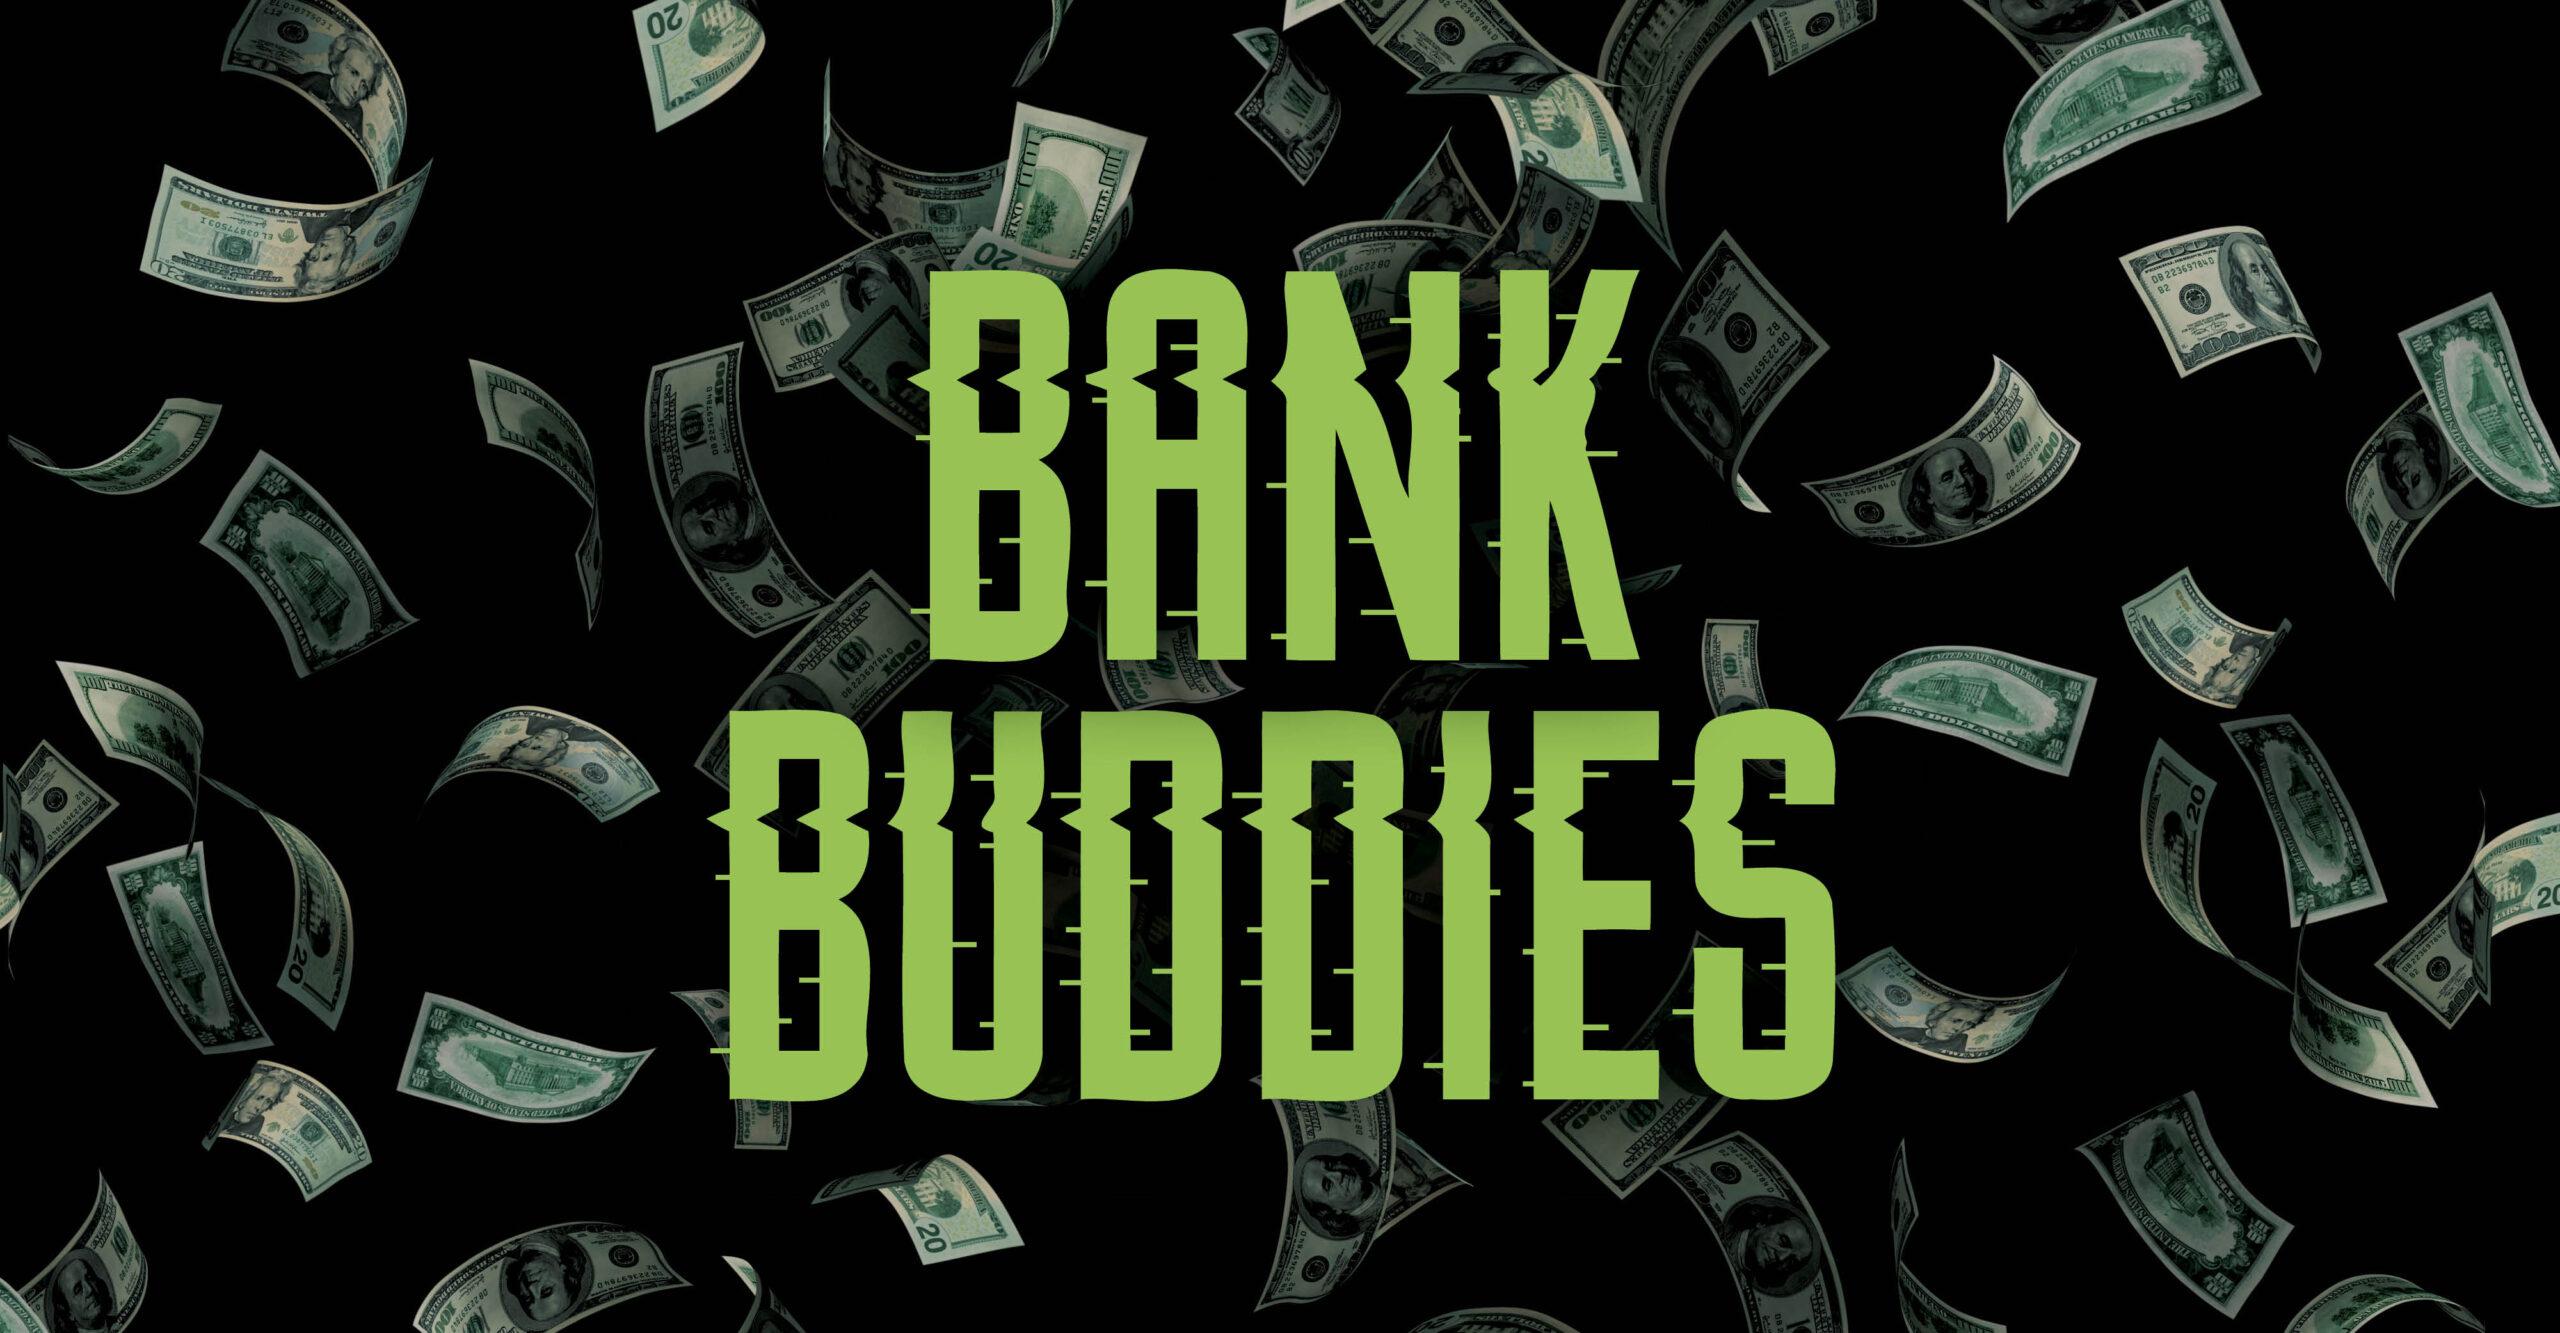 GPC Bank Buddies